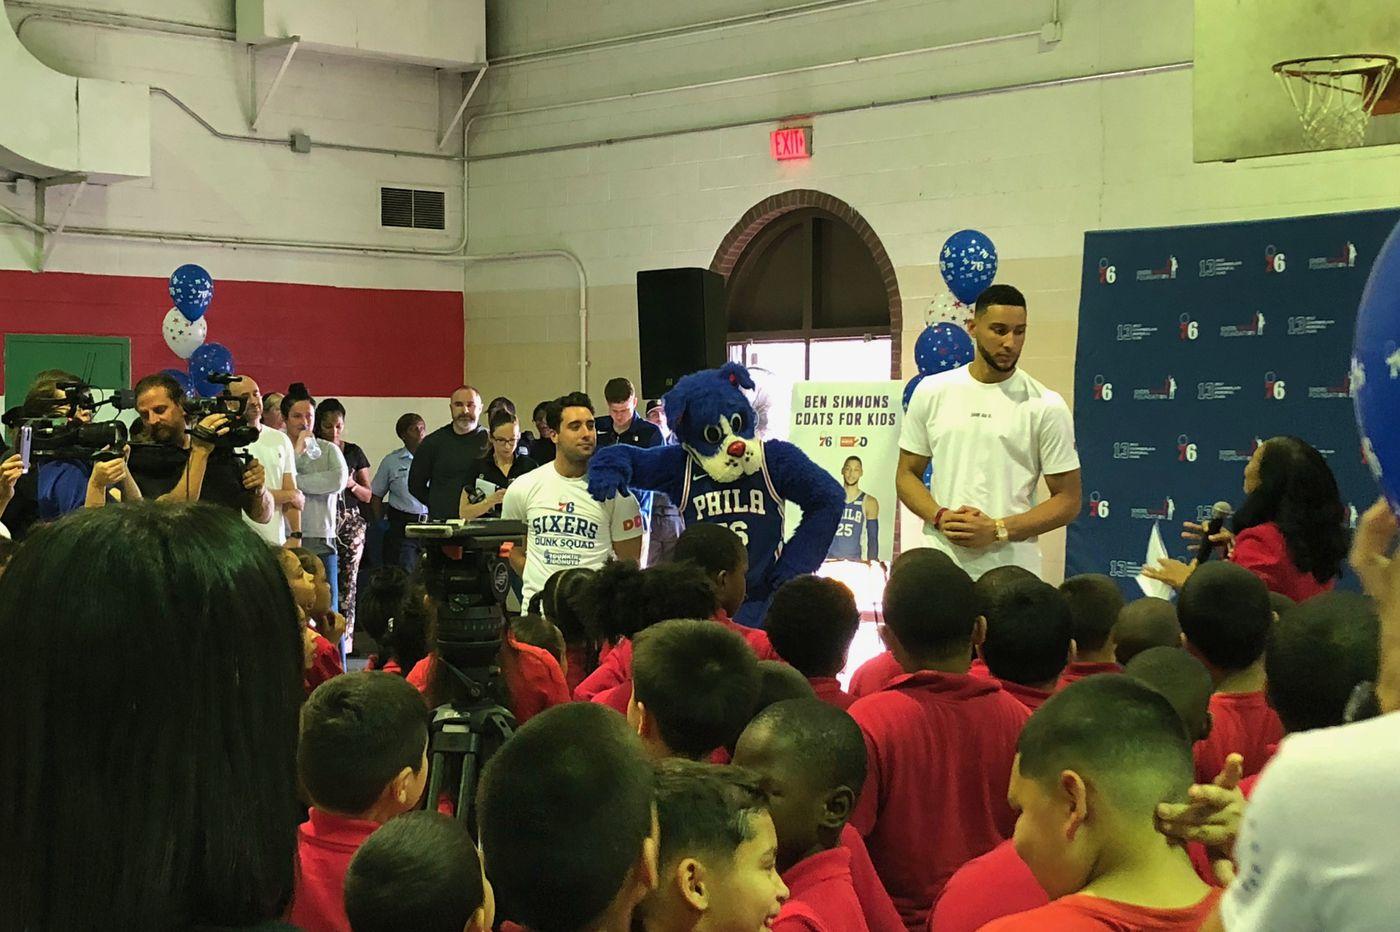 Ben Simmons surprises Cramp Elementary School students with coats